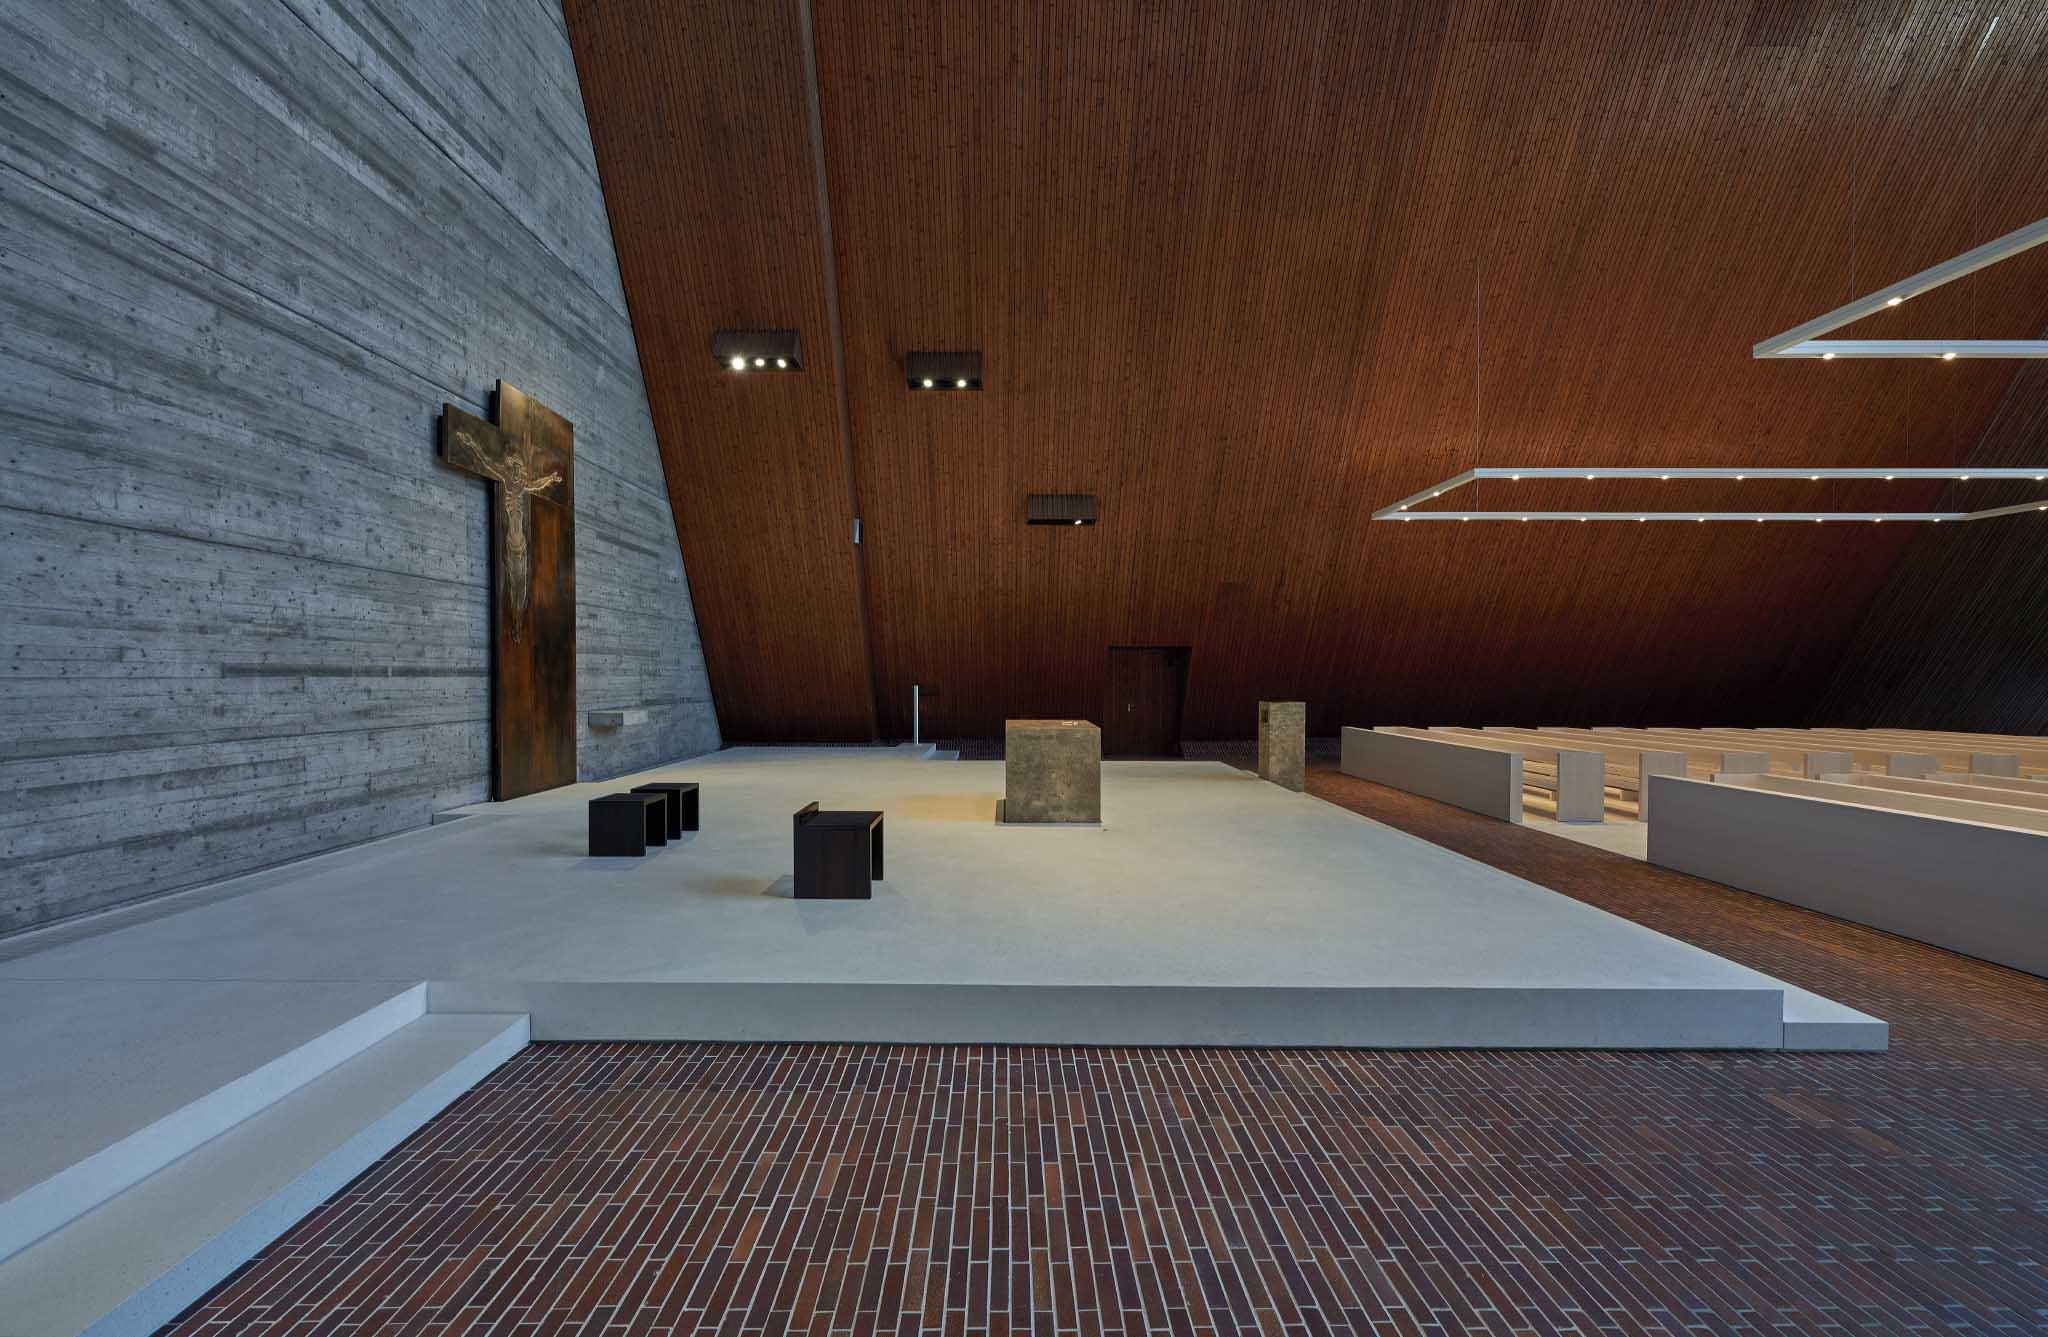 ›altar island‹ with new pedestrial and altar Valentin Wormbs, Stuttgart